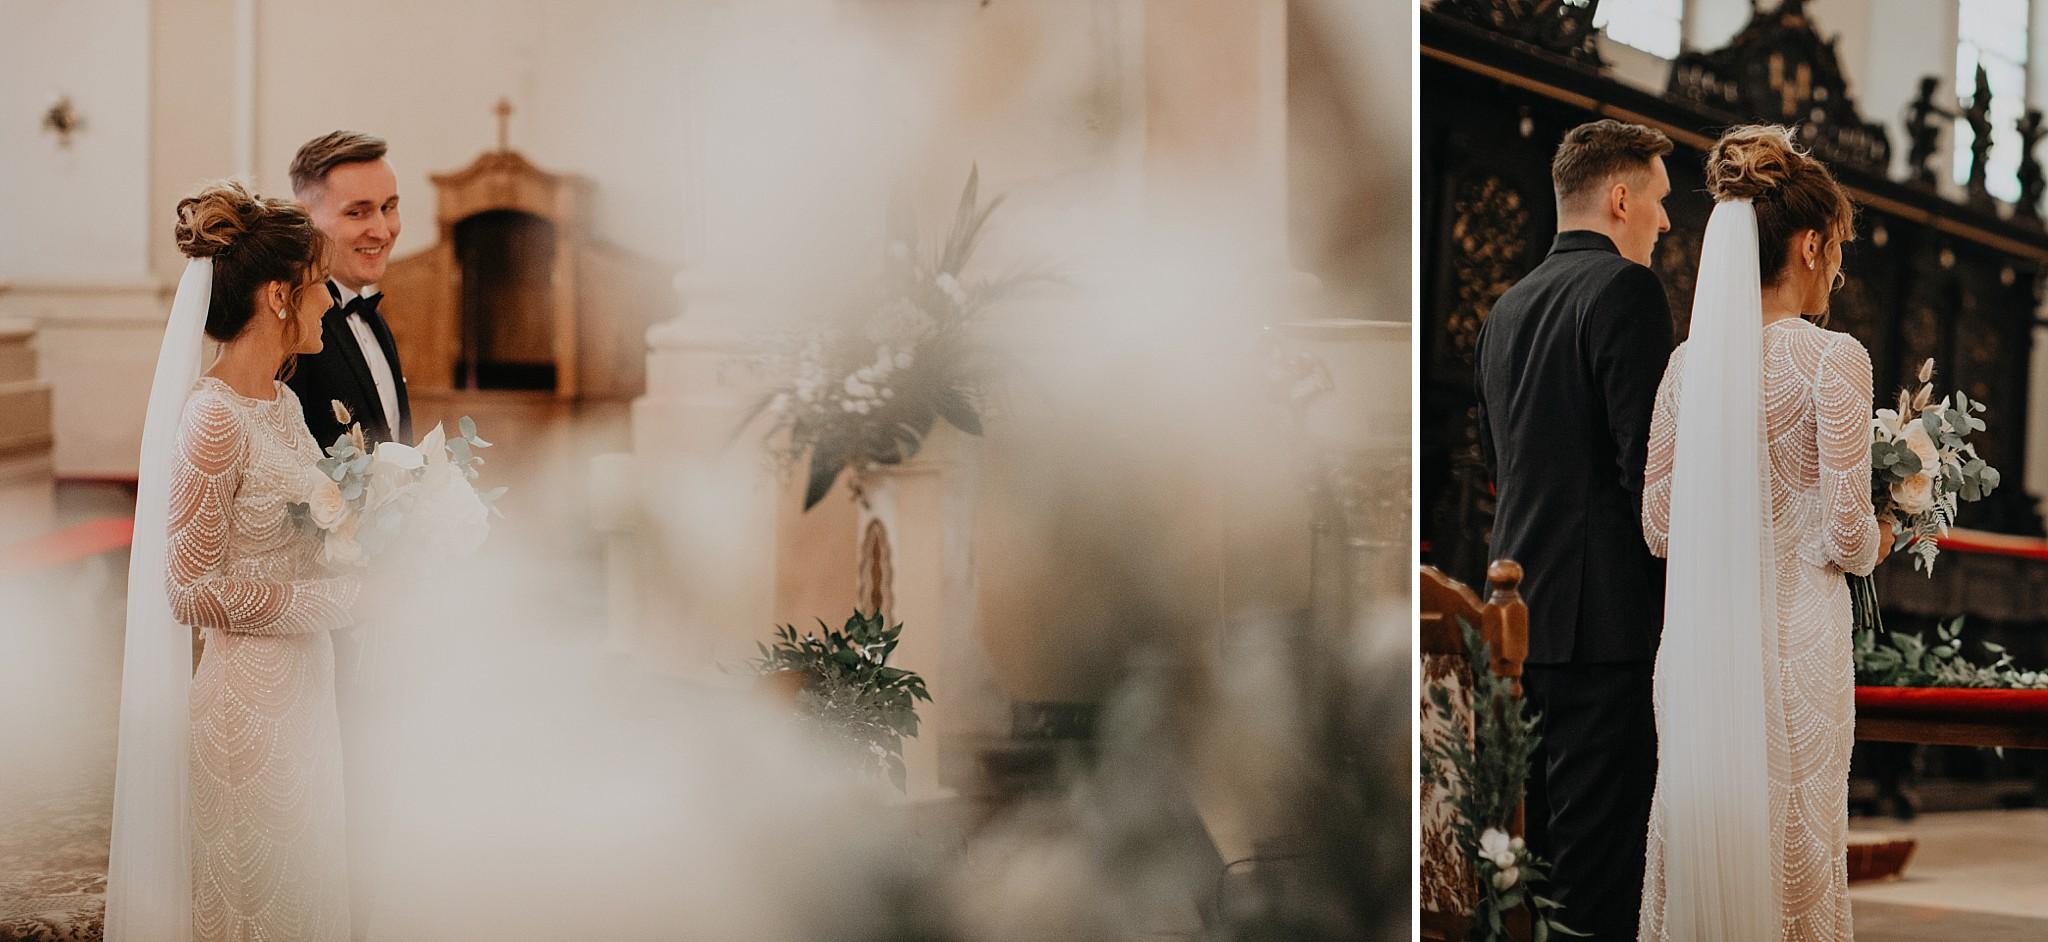 fotograf poznan wesele dobra truskawka piekne wesele pod poznaniem wesele w dobrej truskawce piekna para mloda slub marzen slub koronawirus slub listopad wesele koronawirus 154